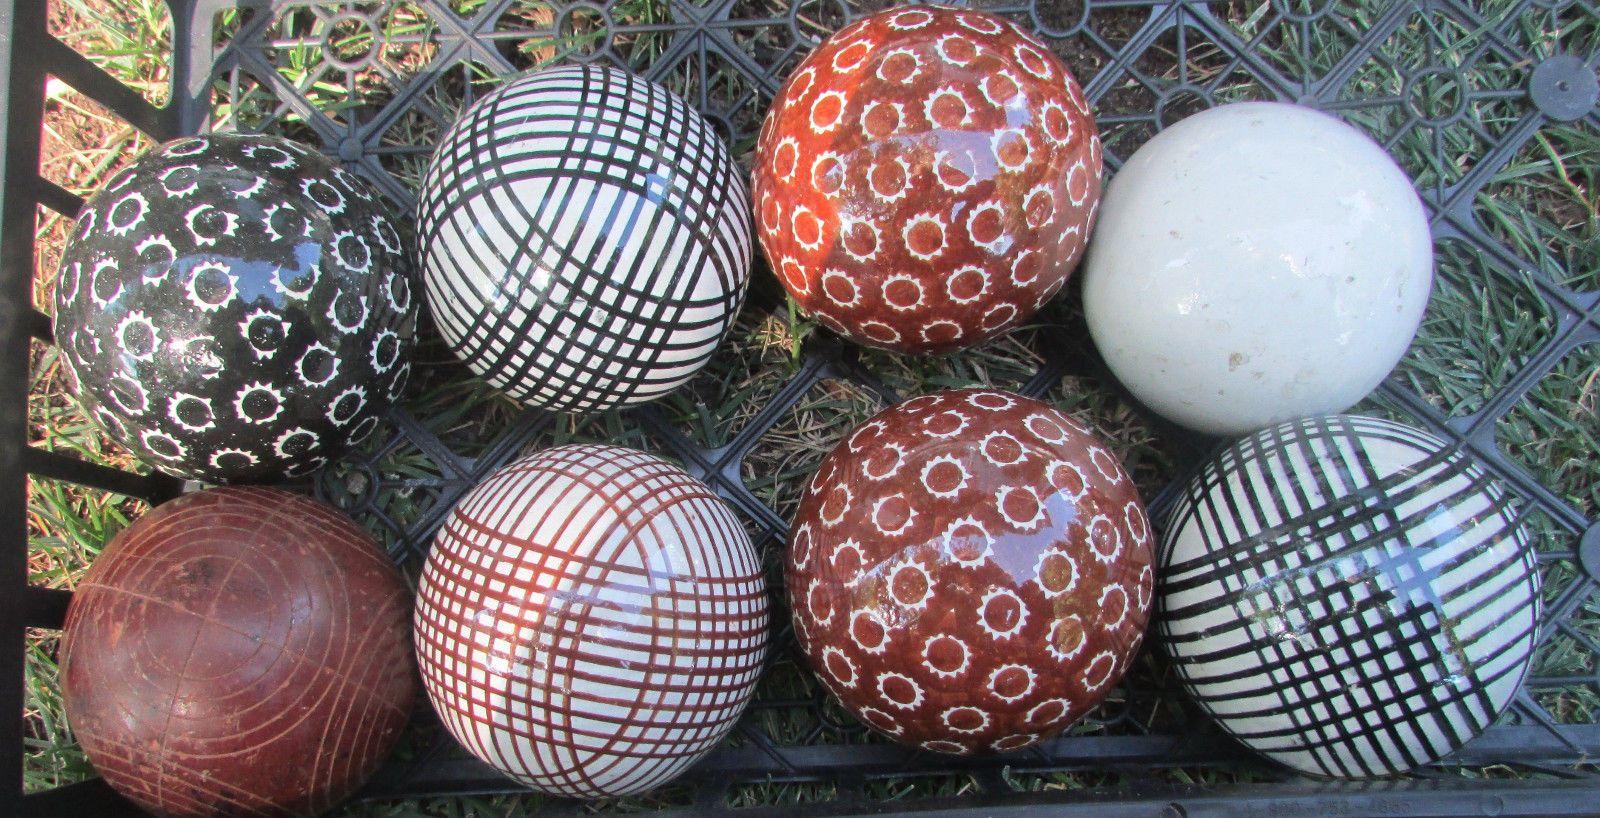 Original Antique Victorian Ceramic Solid Carpet Ball Brown Plaid Design Carpet Bowls Antiques Carpet